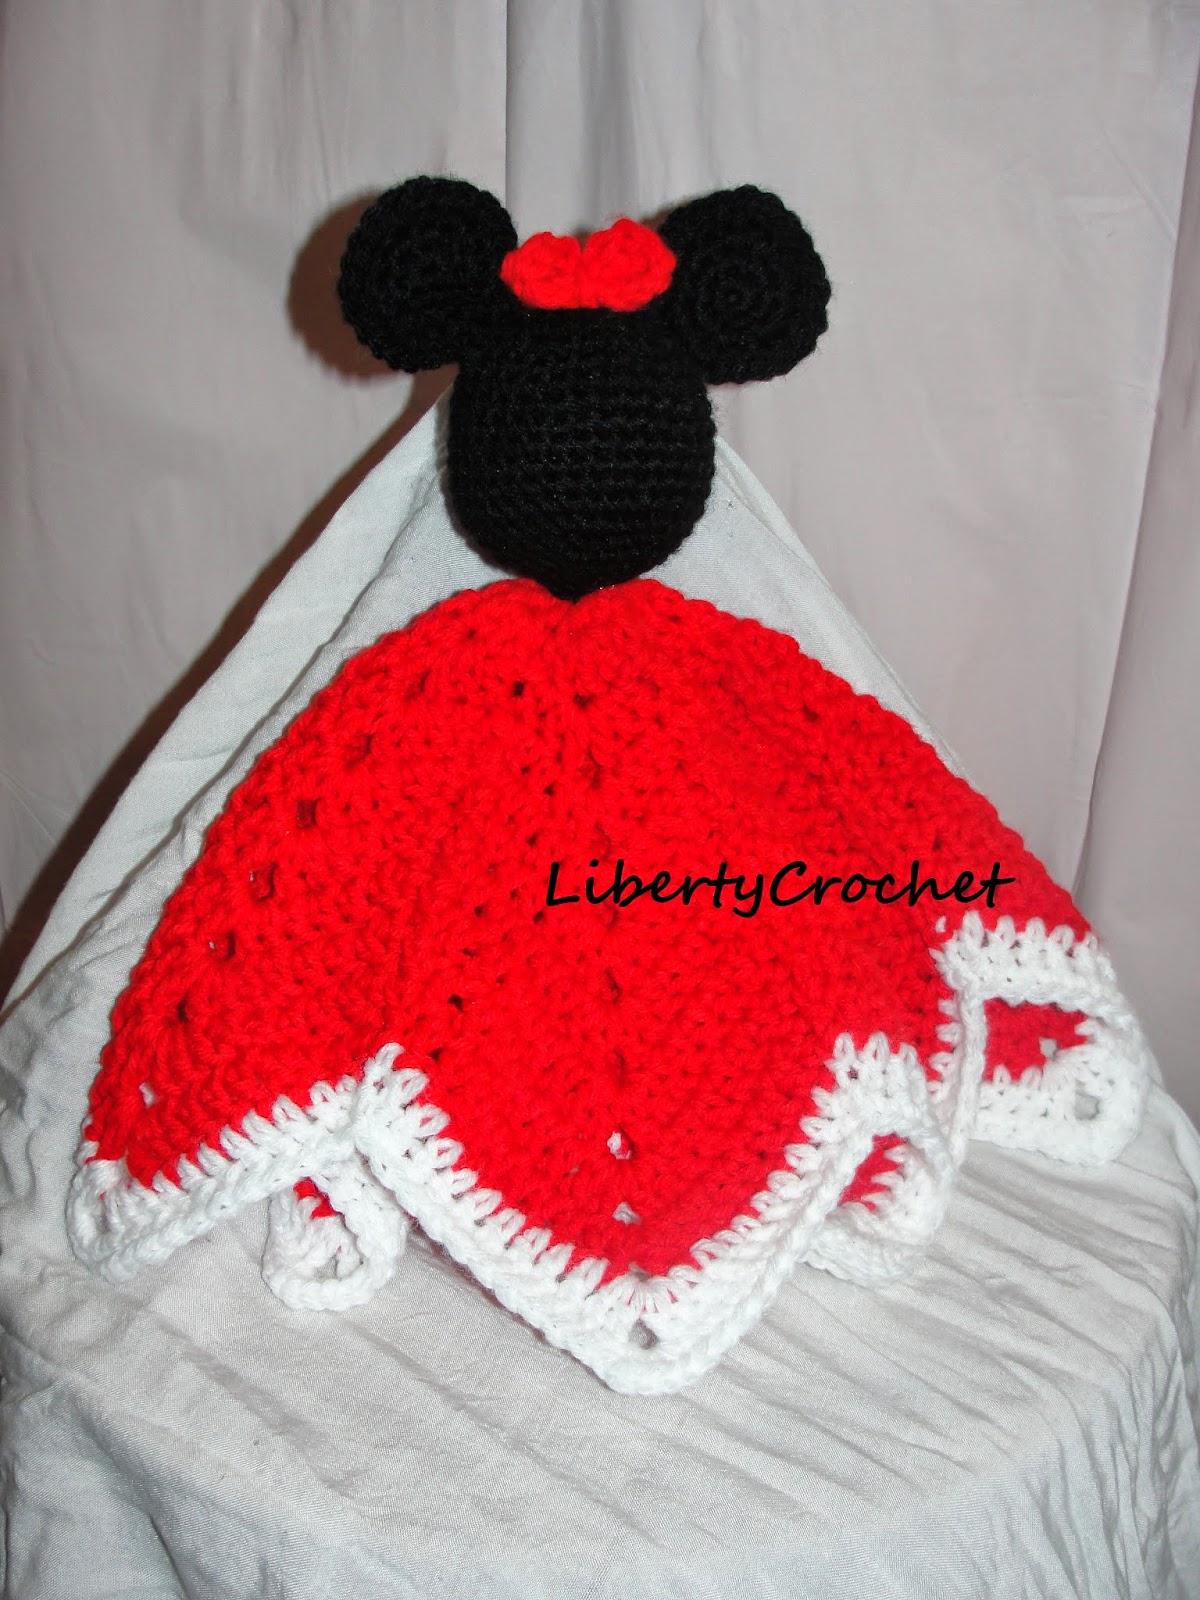 Crochet Blanket Keeps Getting Smaller